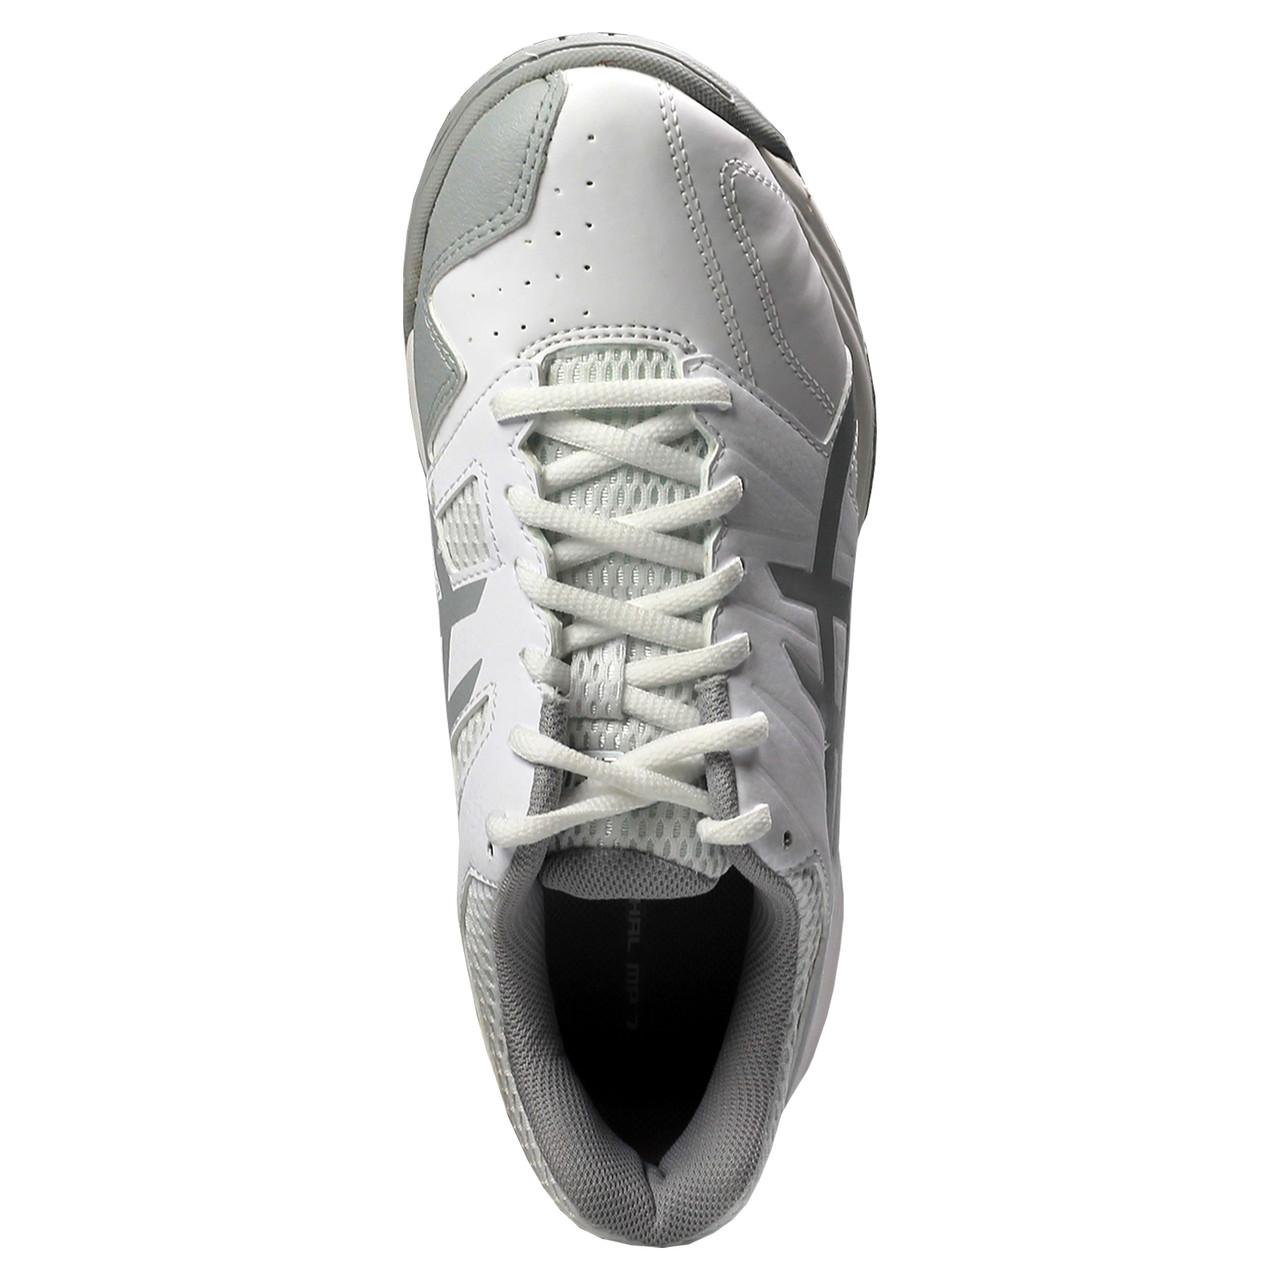 Asics Gel Lethal MP7 Women's Field Hockey Lacrosse Turf Cleats White, Gray